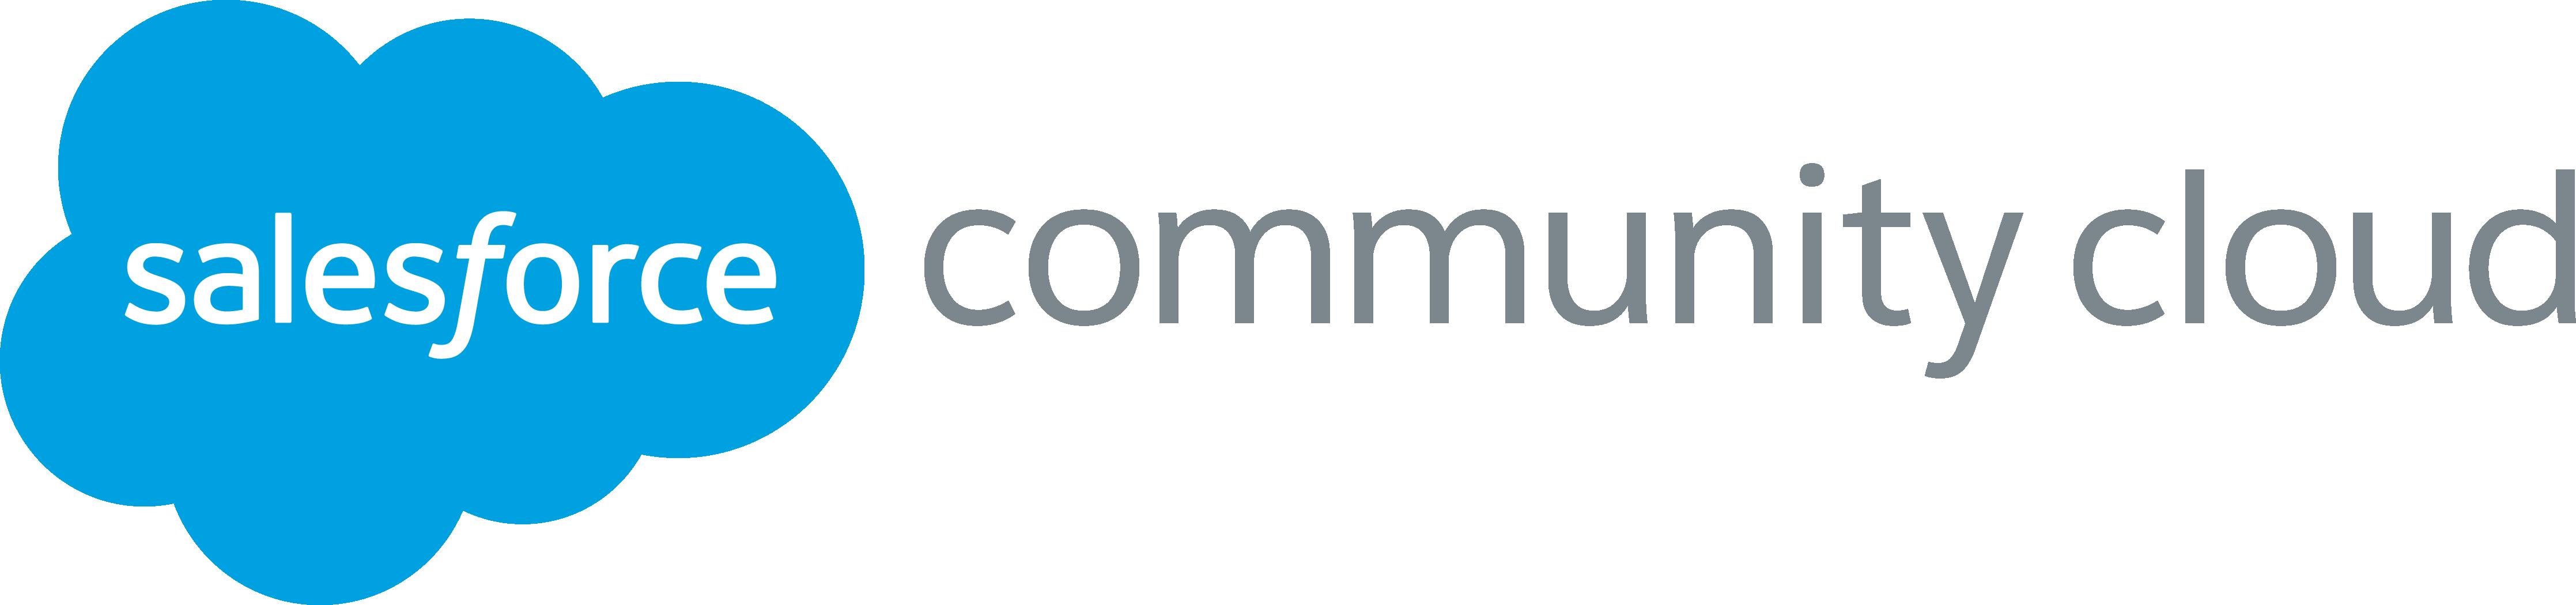 Custom Community Error Page